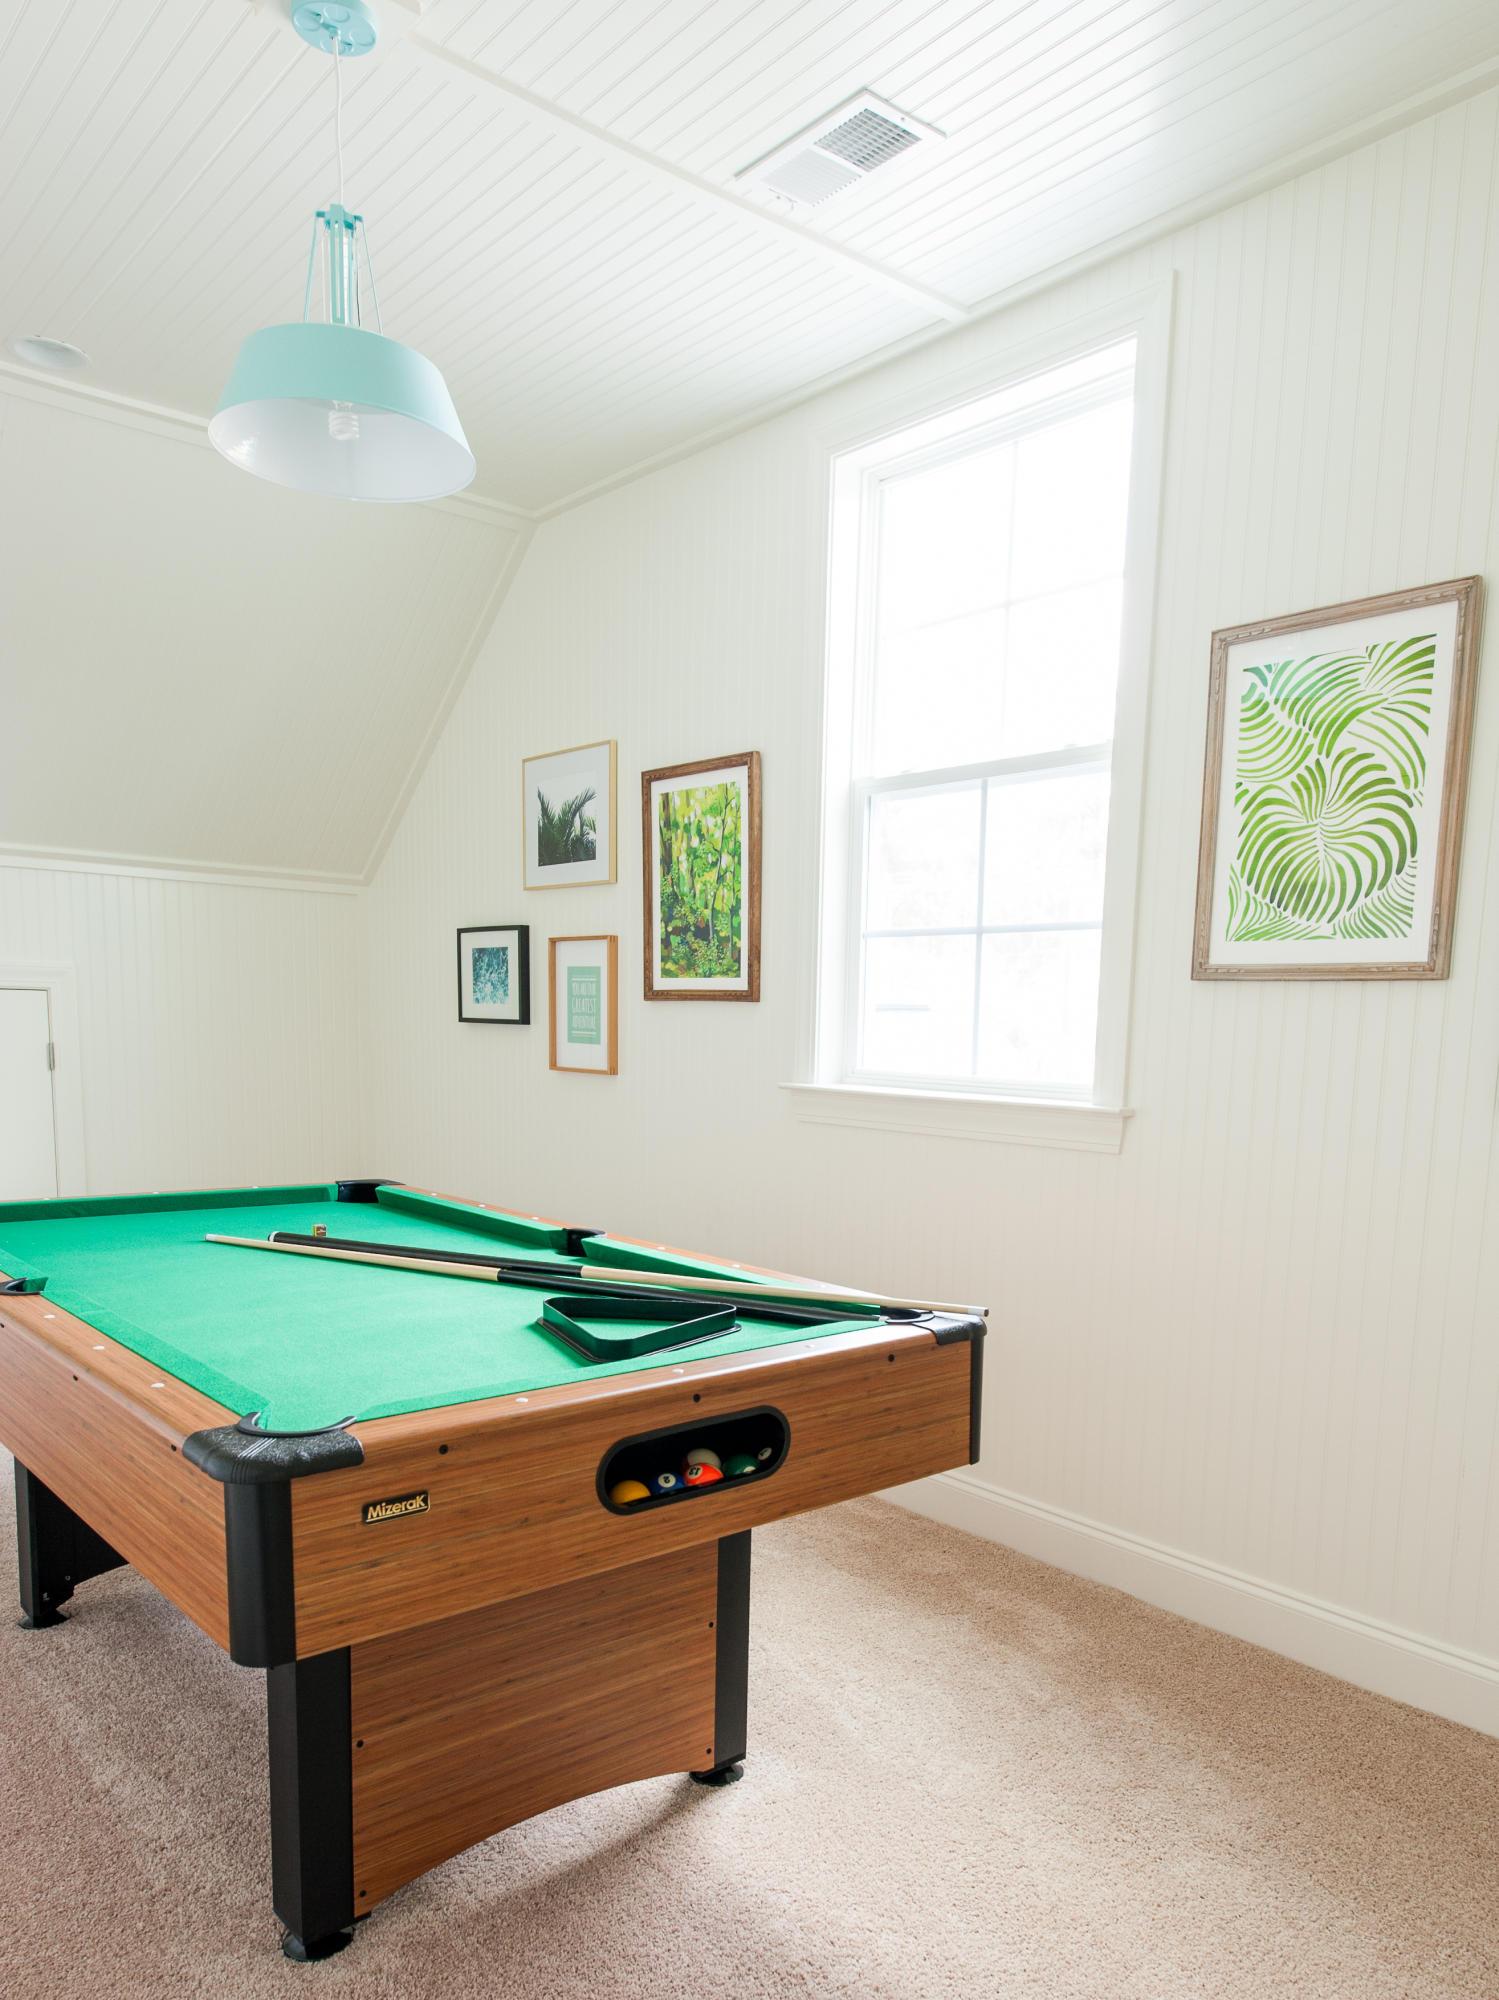 Park West Homes For Sale - 3 Brightwood, Mount Pleasant, SC - 14